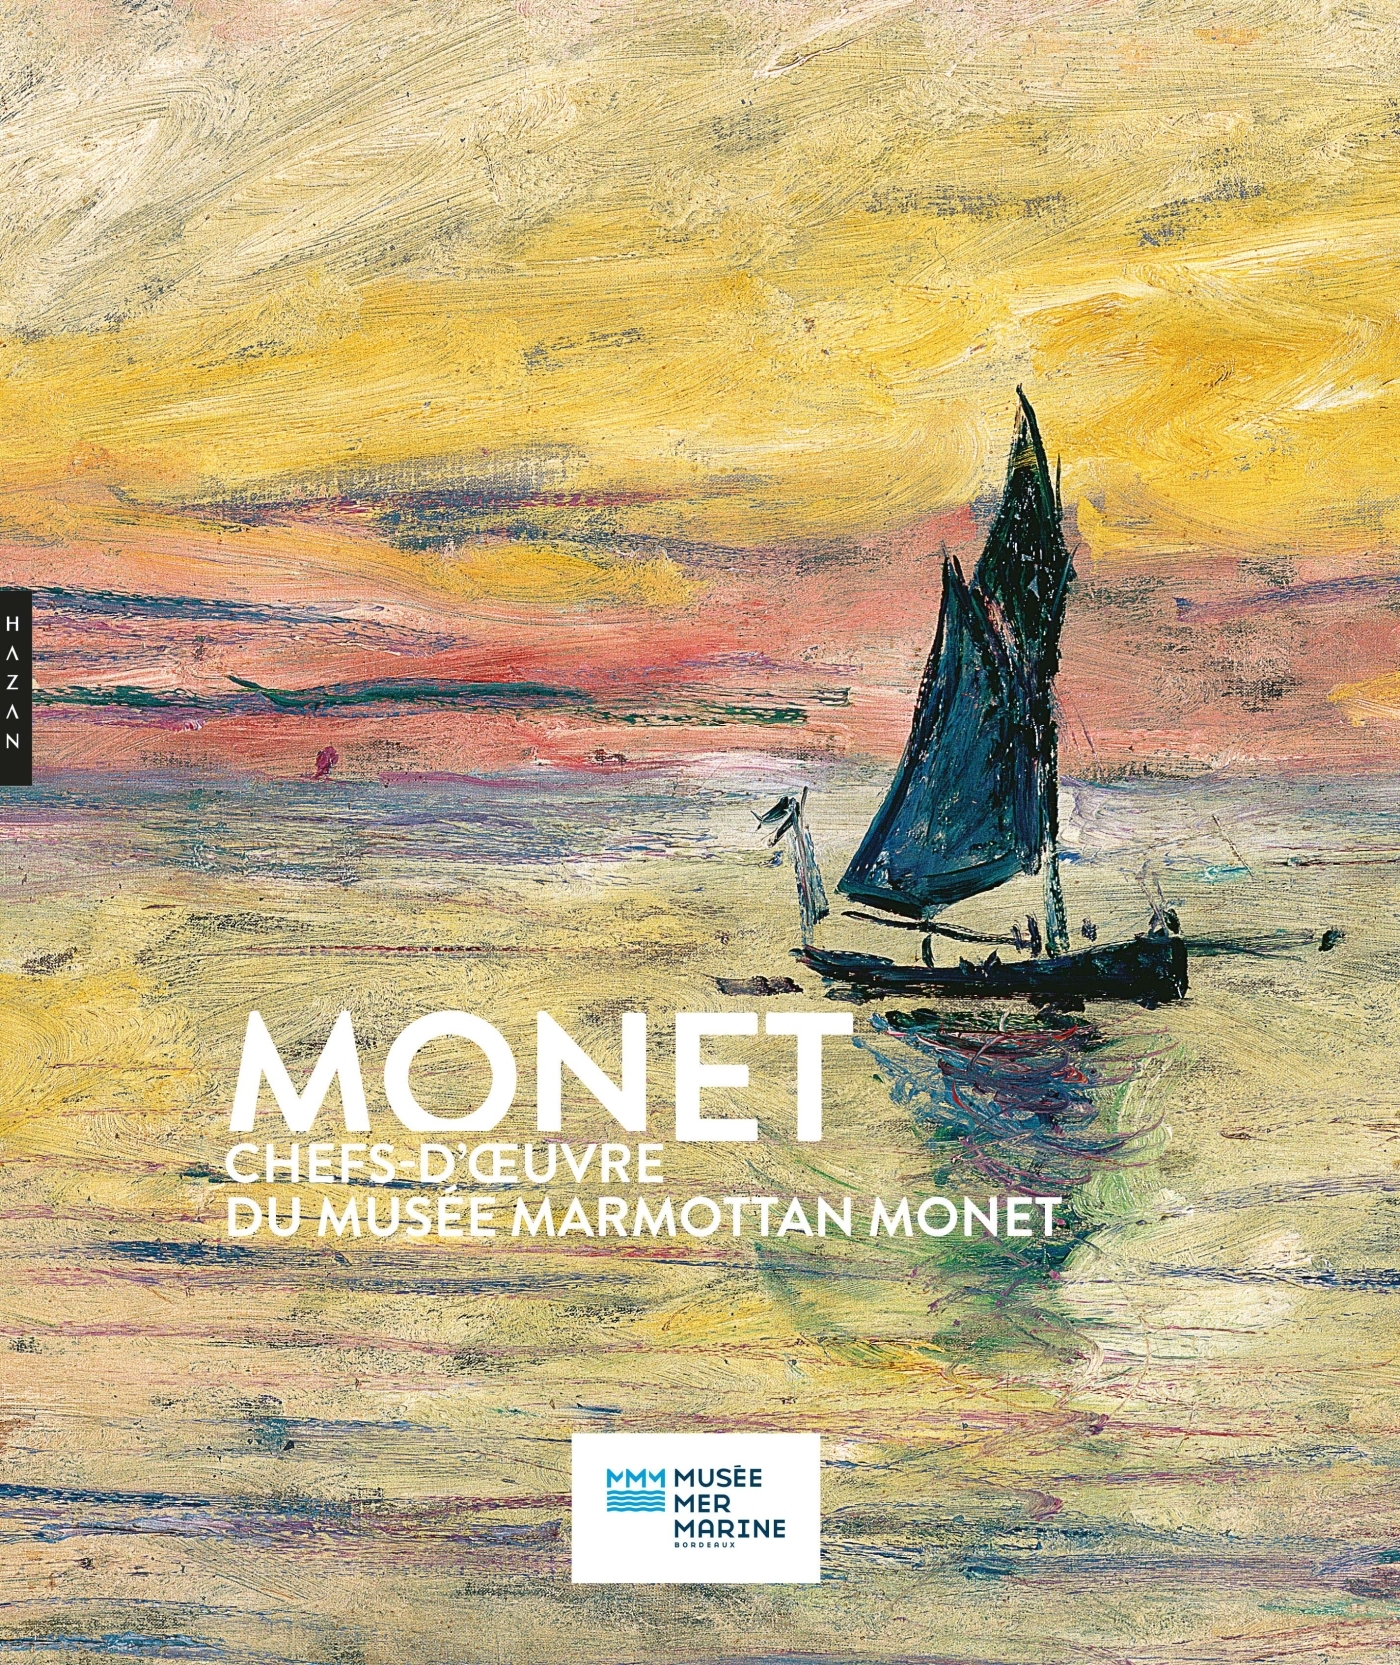 MONET, CHEFS-D'OEUVRE DU MUSEE MARMOTTAN MONET